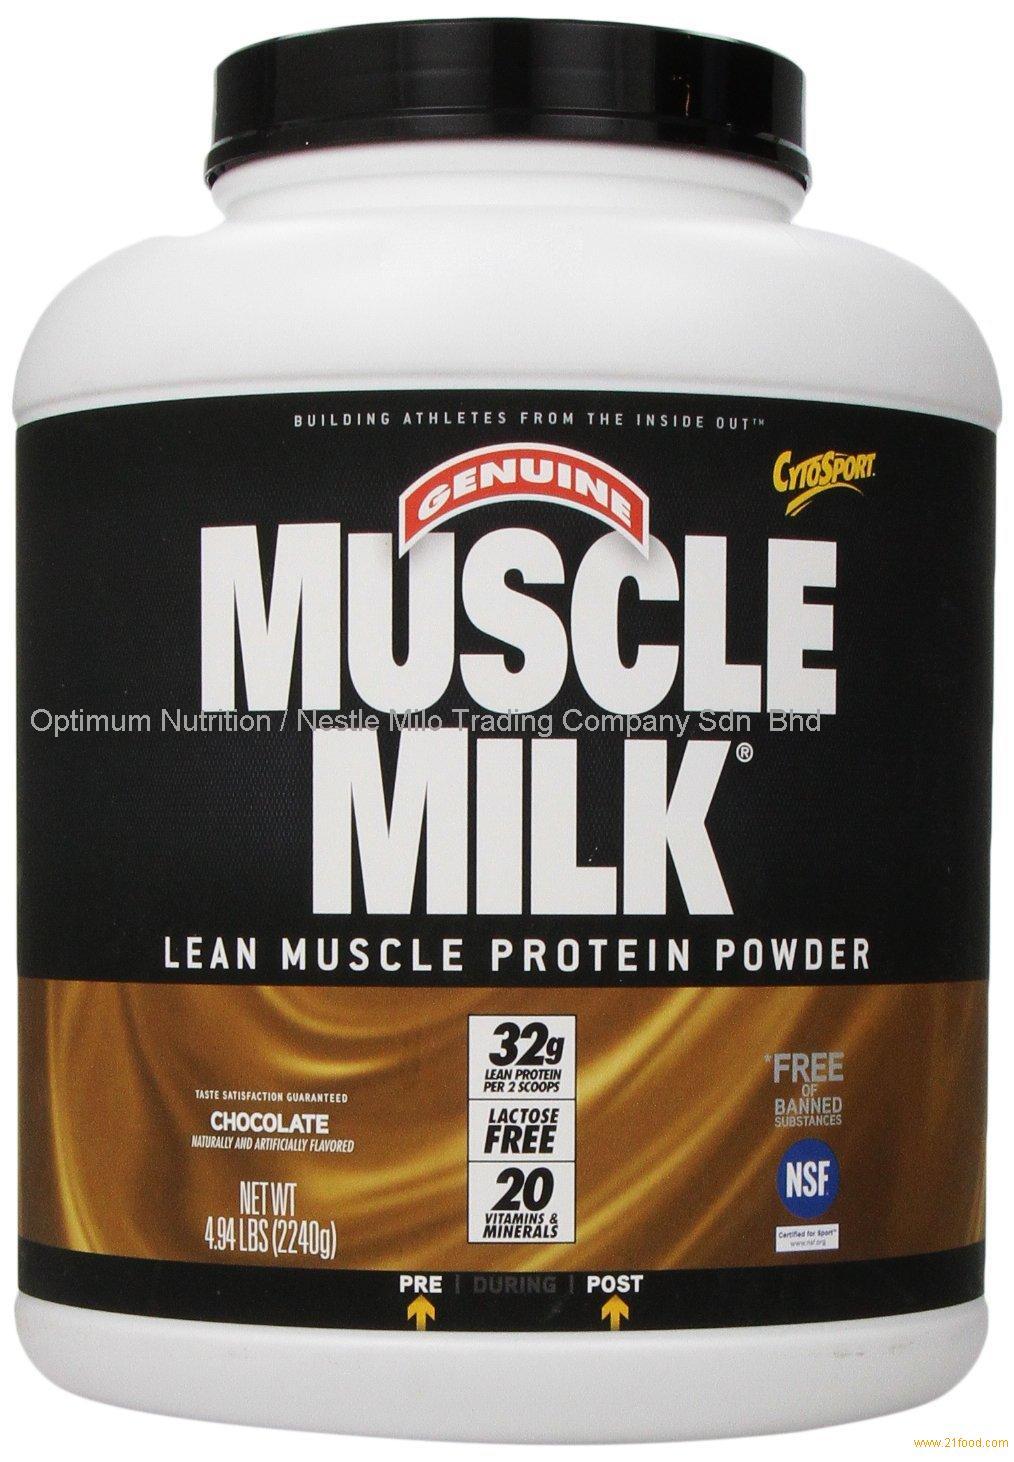 CytoSport Muscle Milk Lean Muscle Protein Powder ...